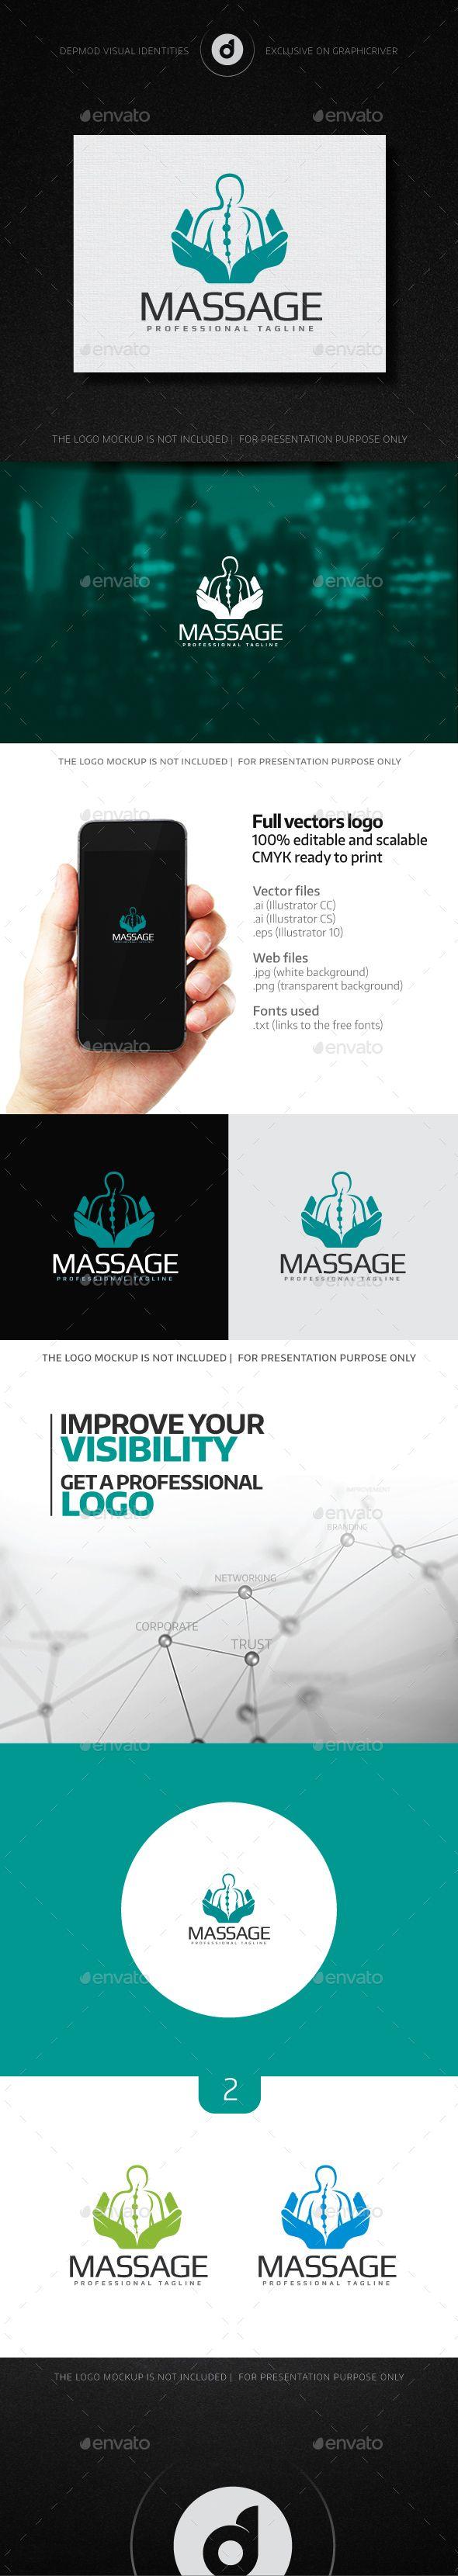 Massage Logo Template Vector EPS, AI. Download here: http://graphicriver.net/item/massage-logo/14543815?ref=ksioks